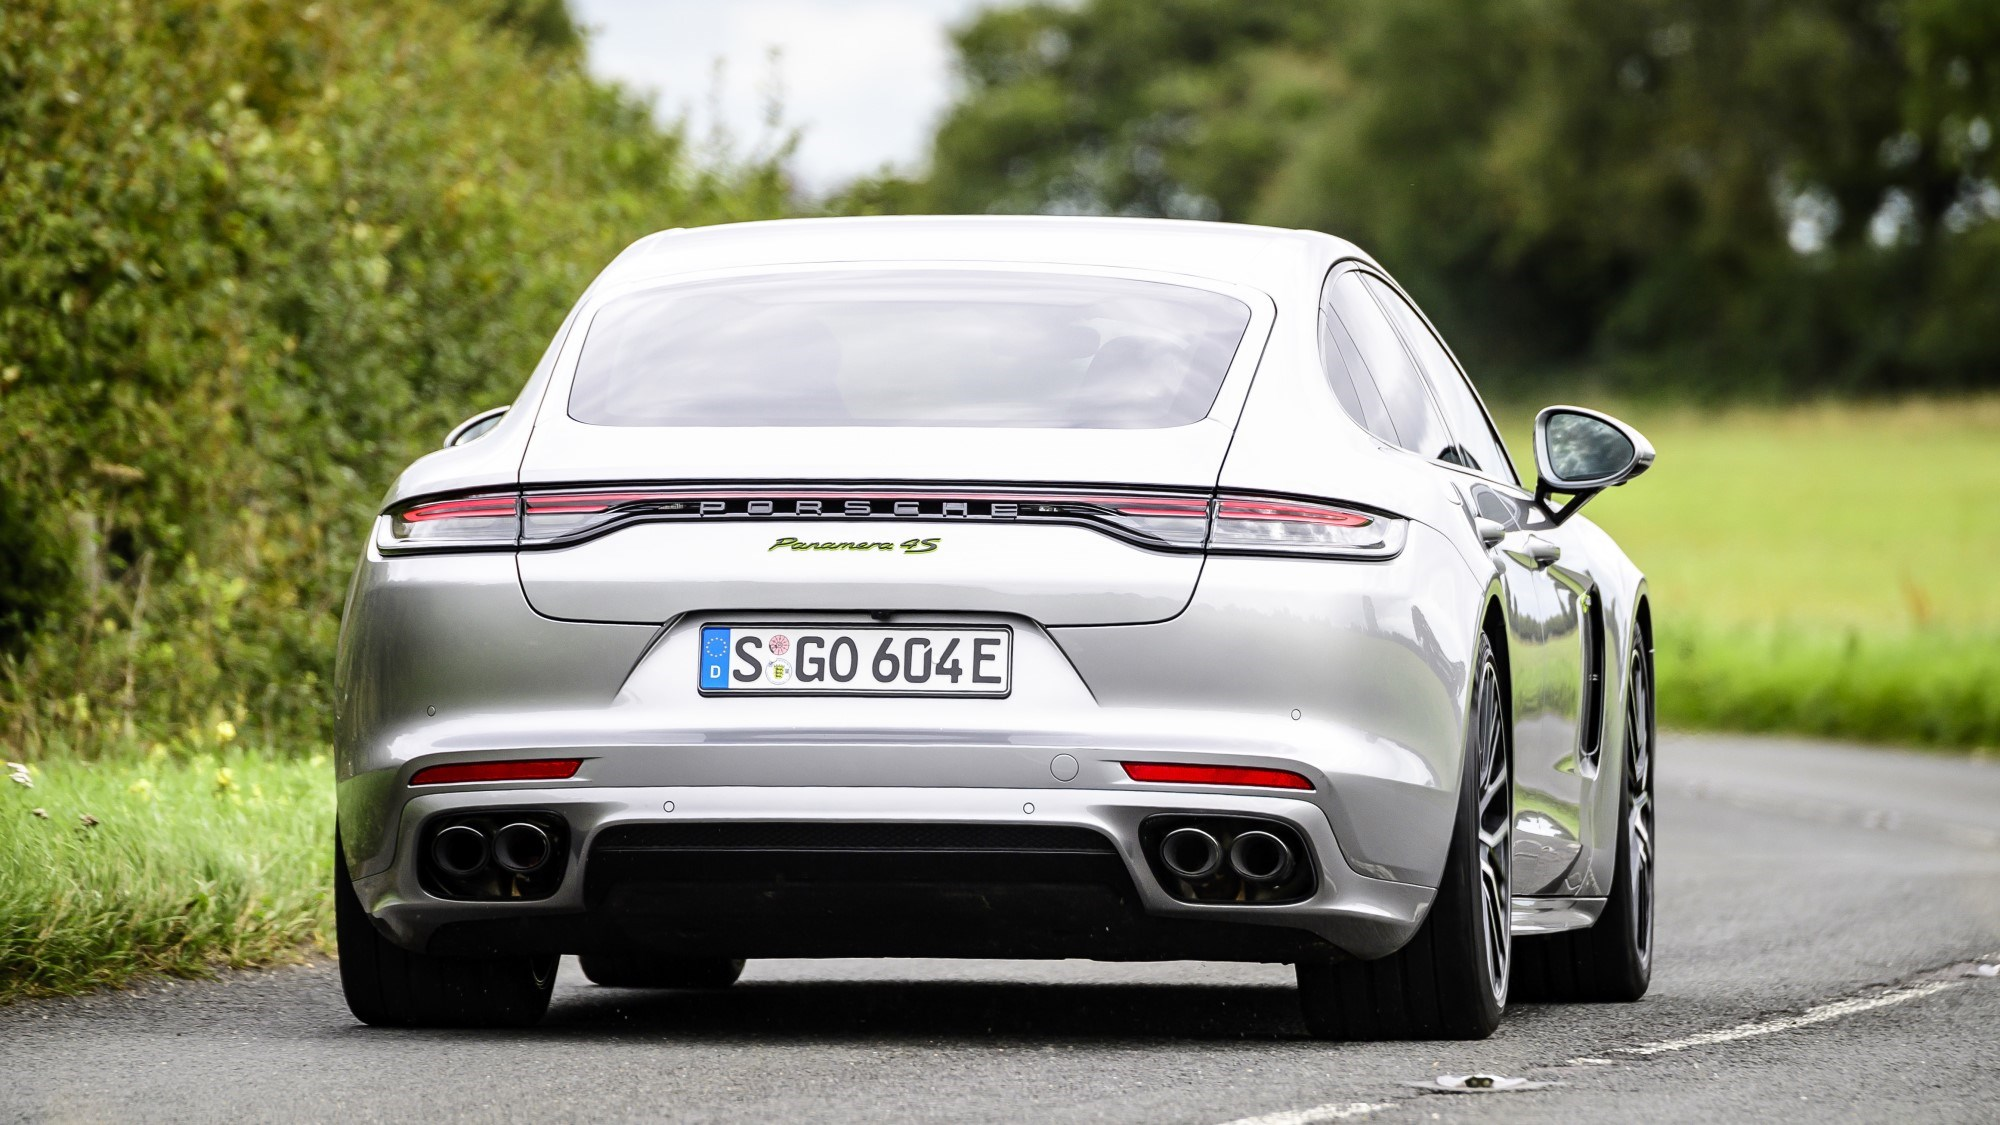 2020 Porsche Panamera hybrid - rear